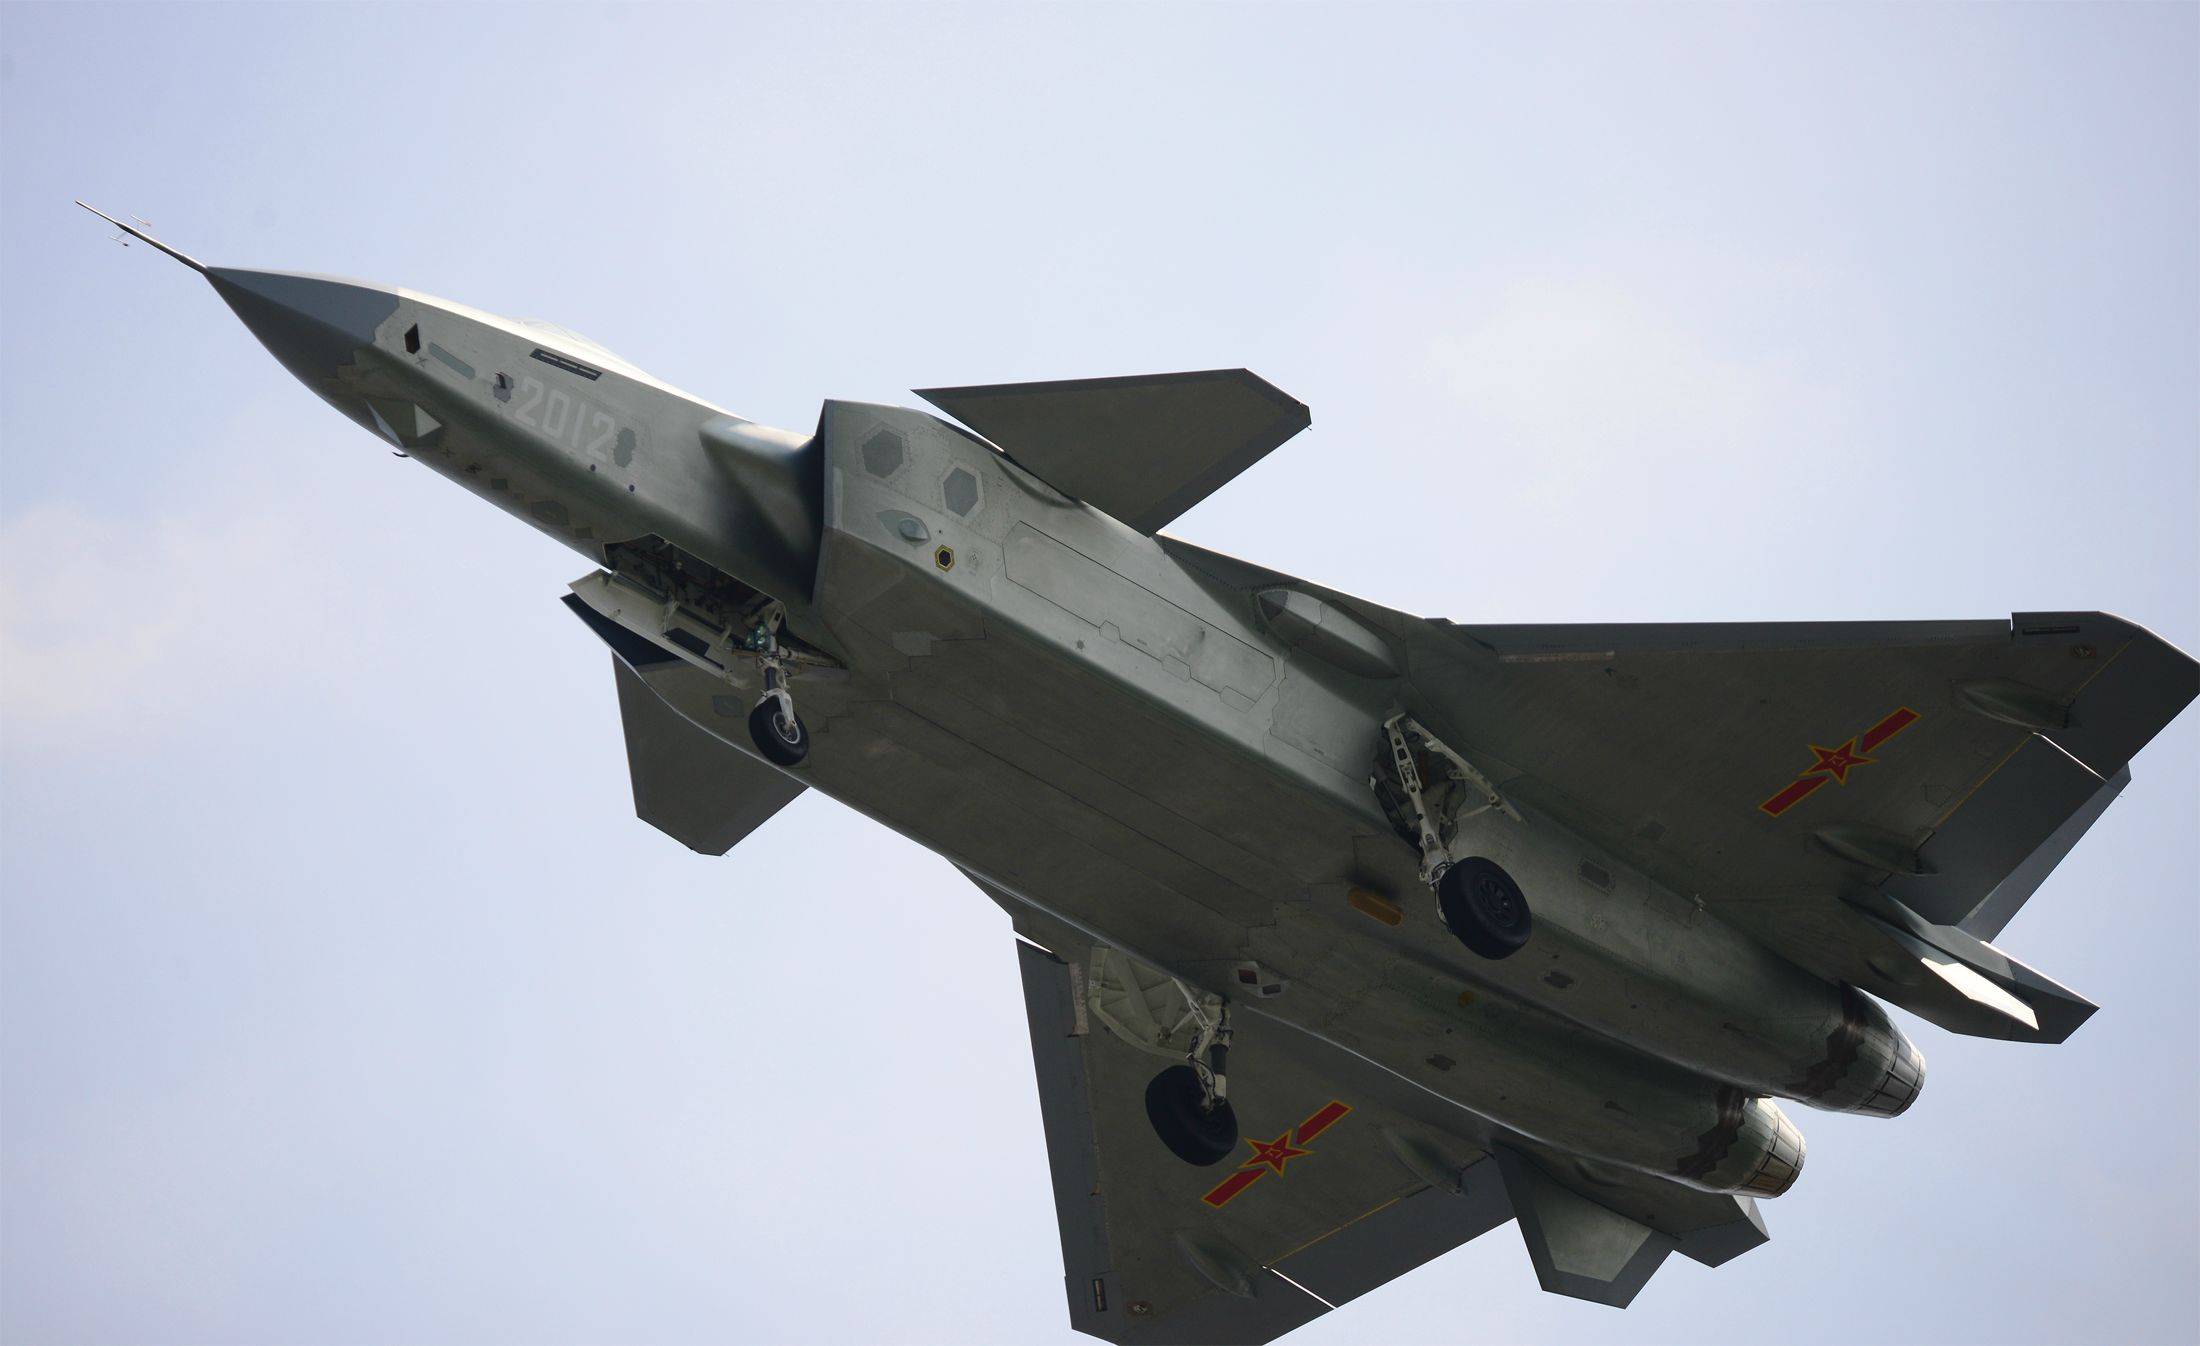 J-20 2012 - 2